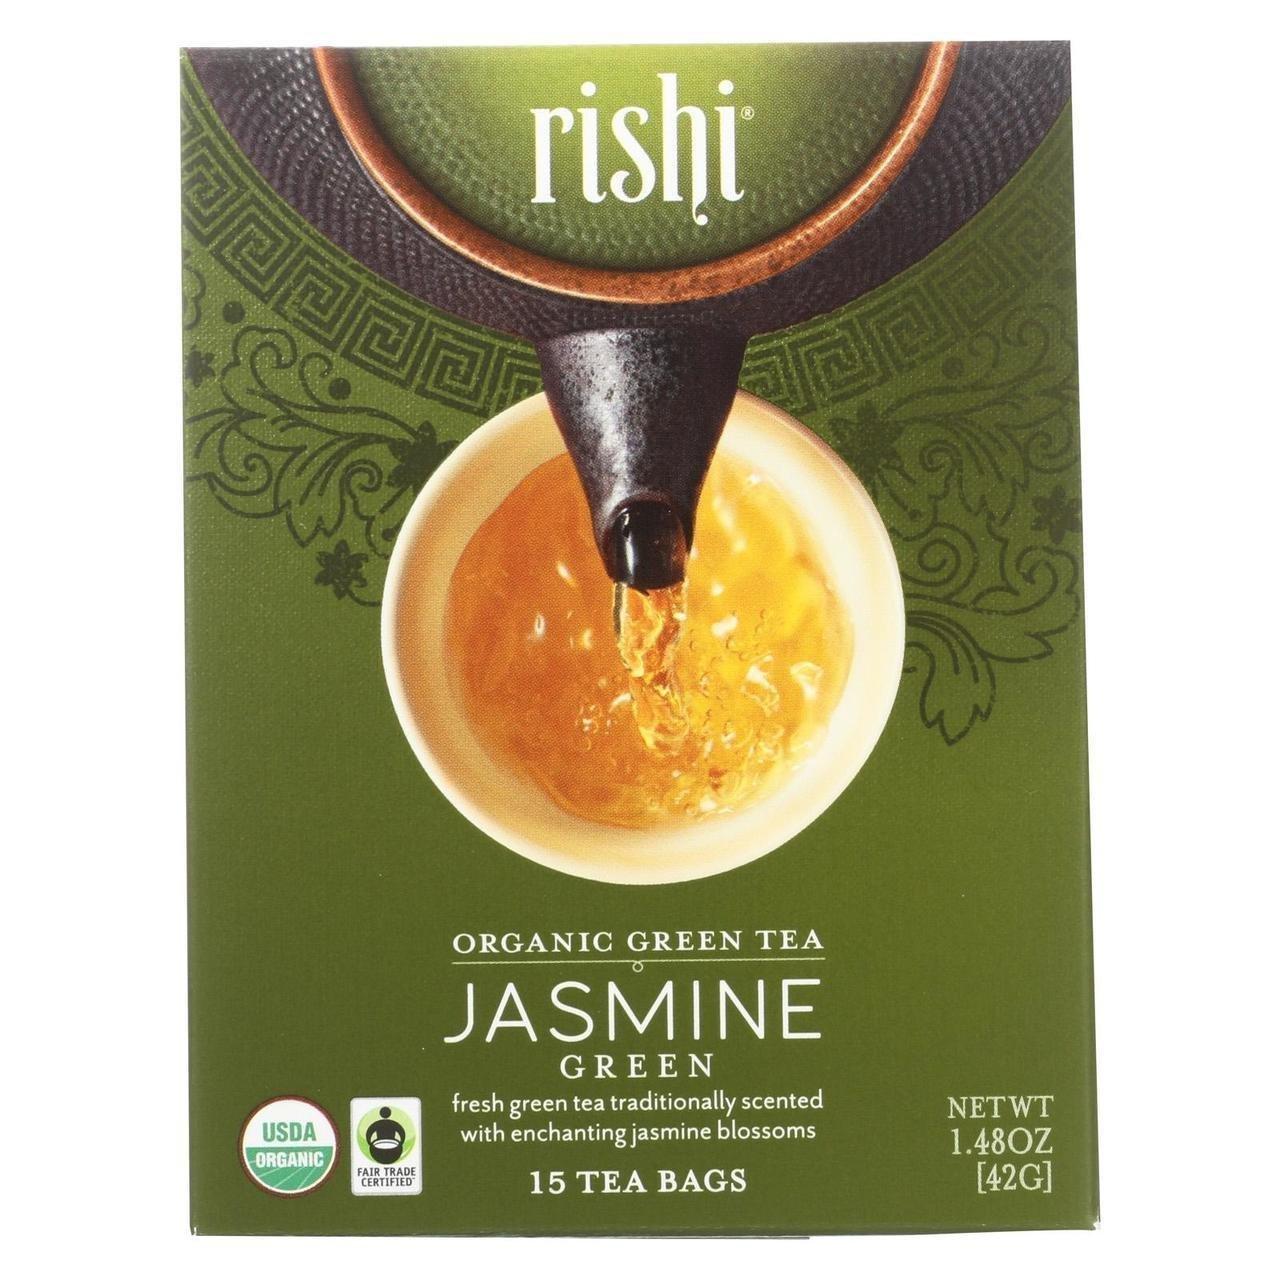 Rishi Jasmine Tea, Organic Green Tea Sachets, 15 Count Tea Bags